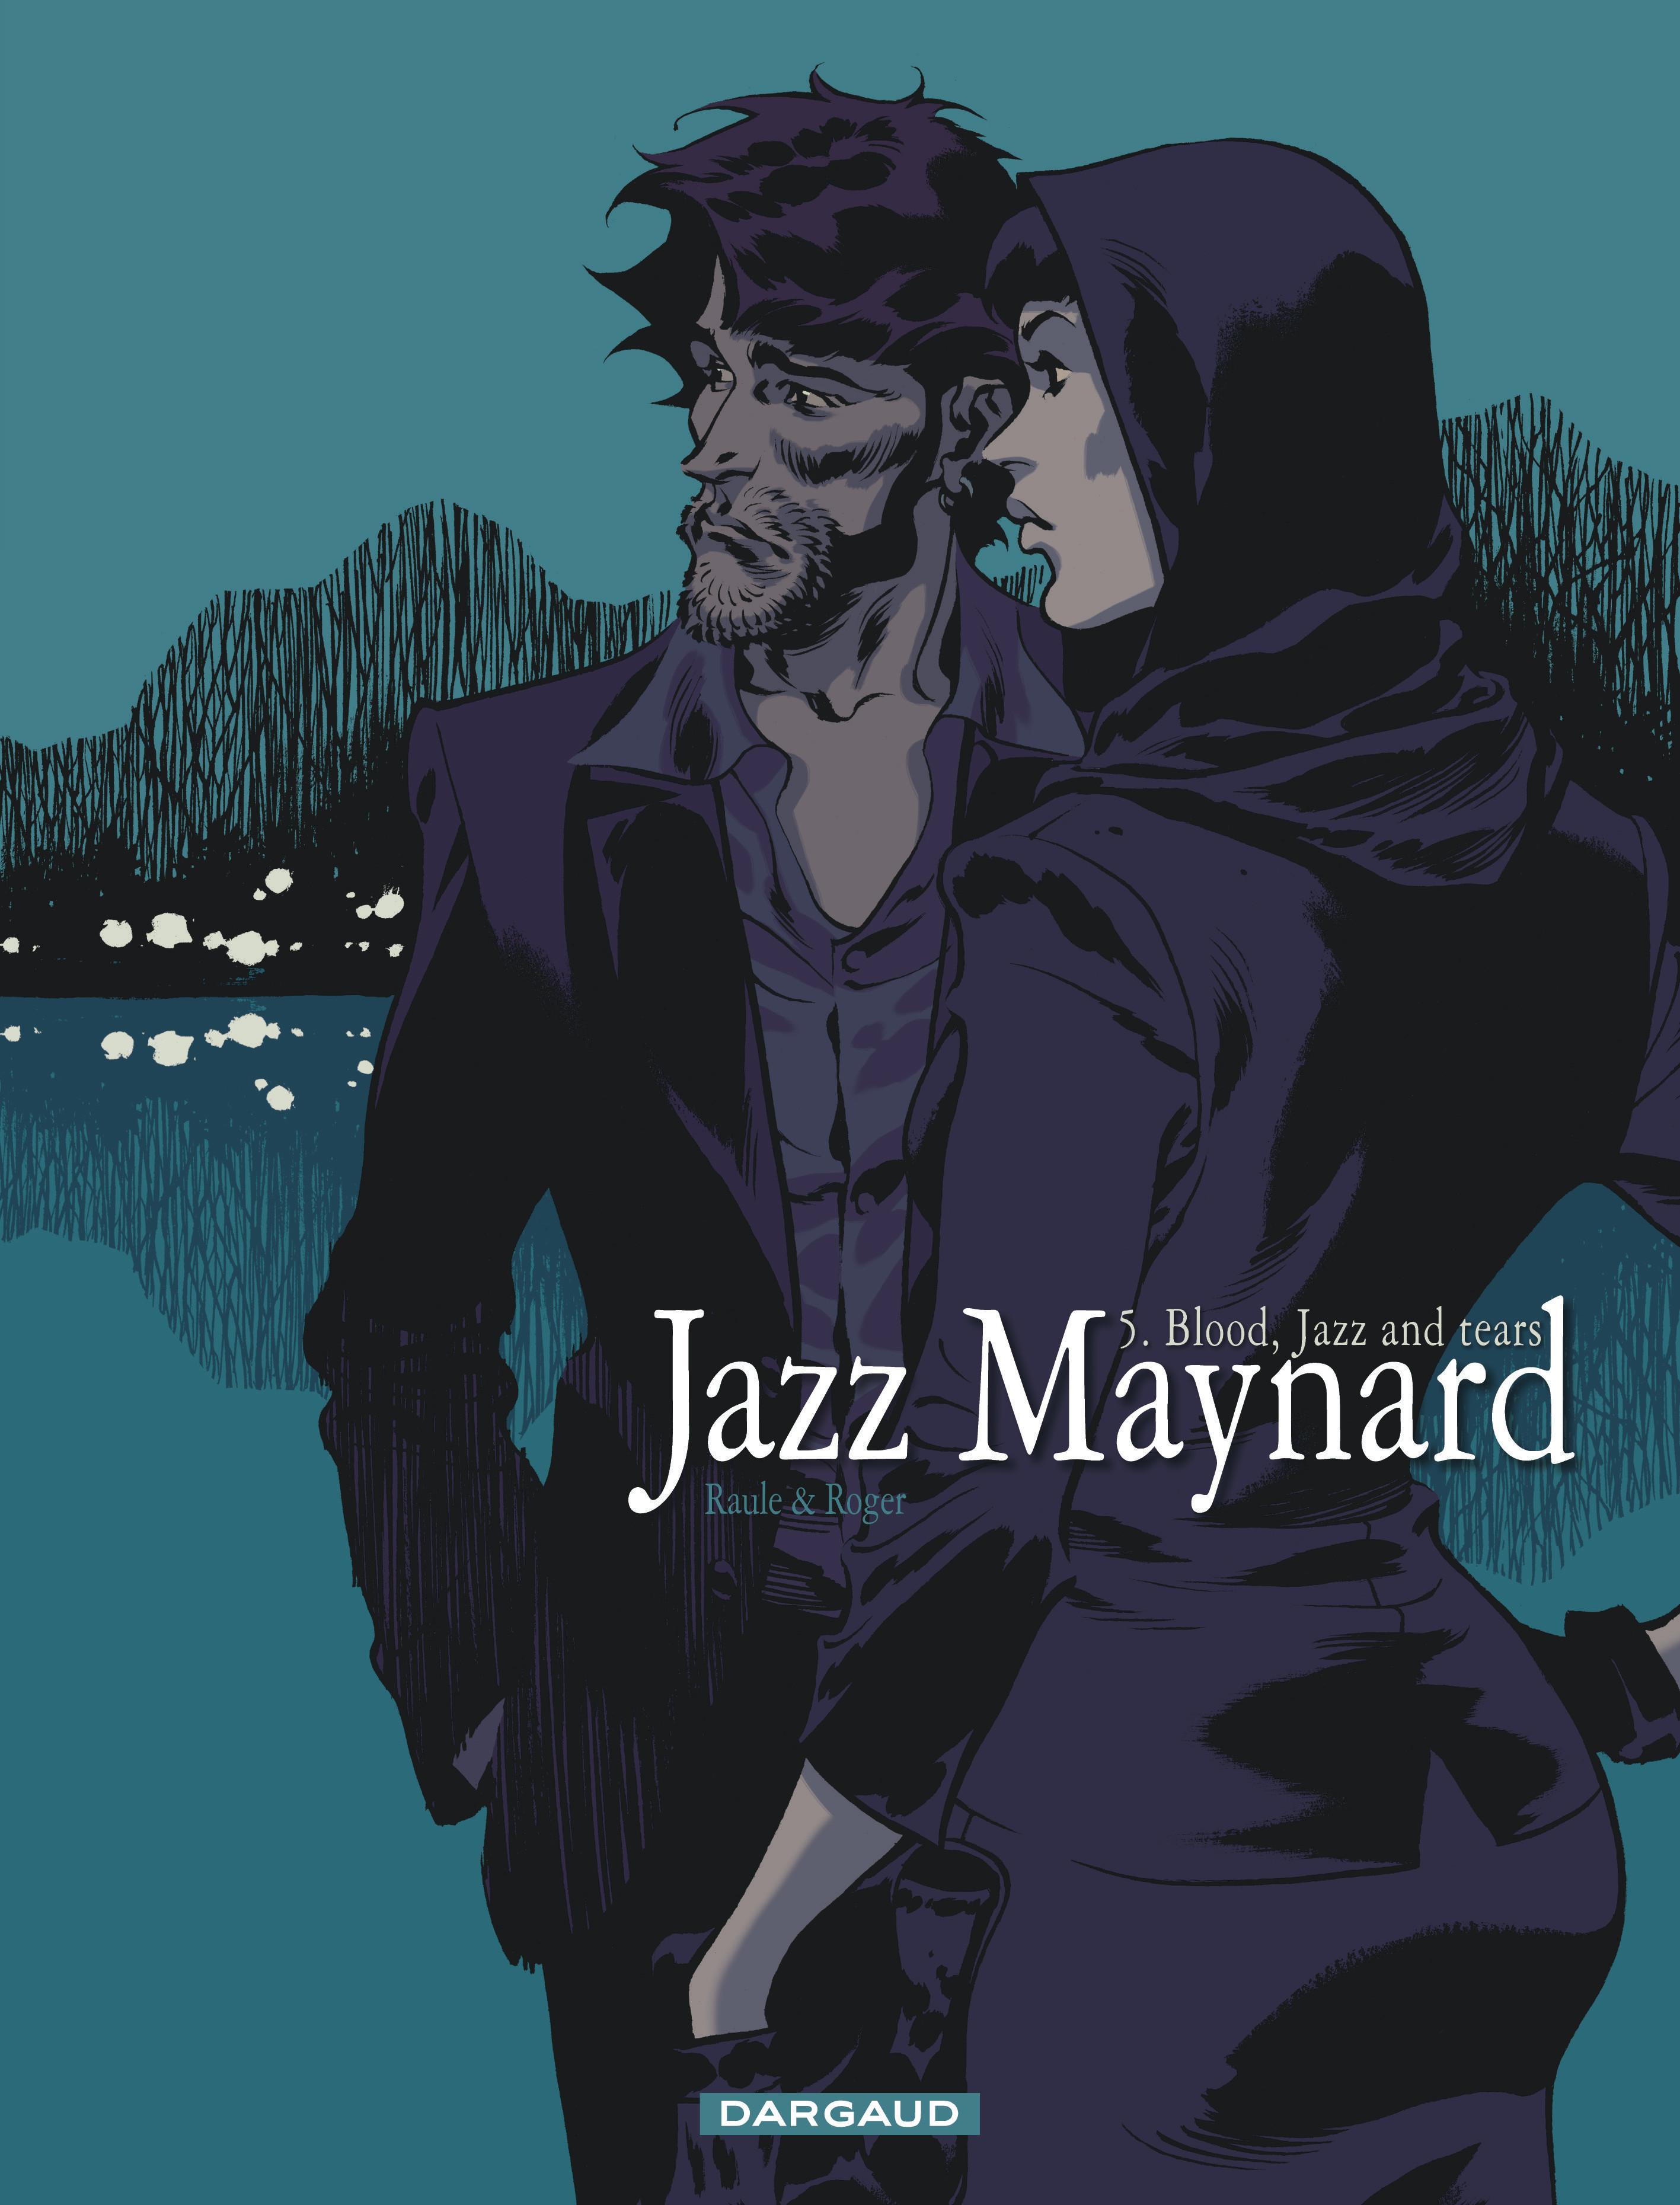 Jazz Maynard 5 - Jazz and tears